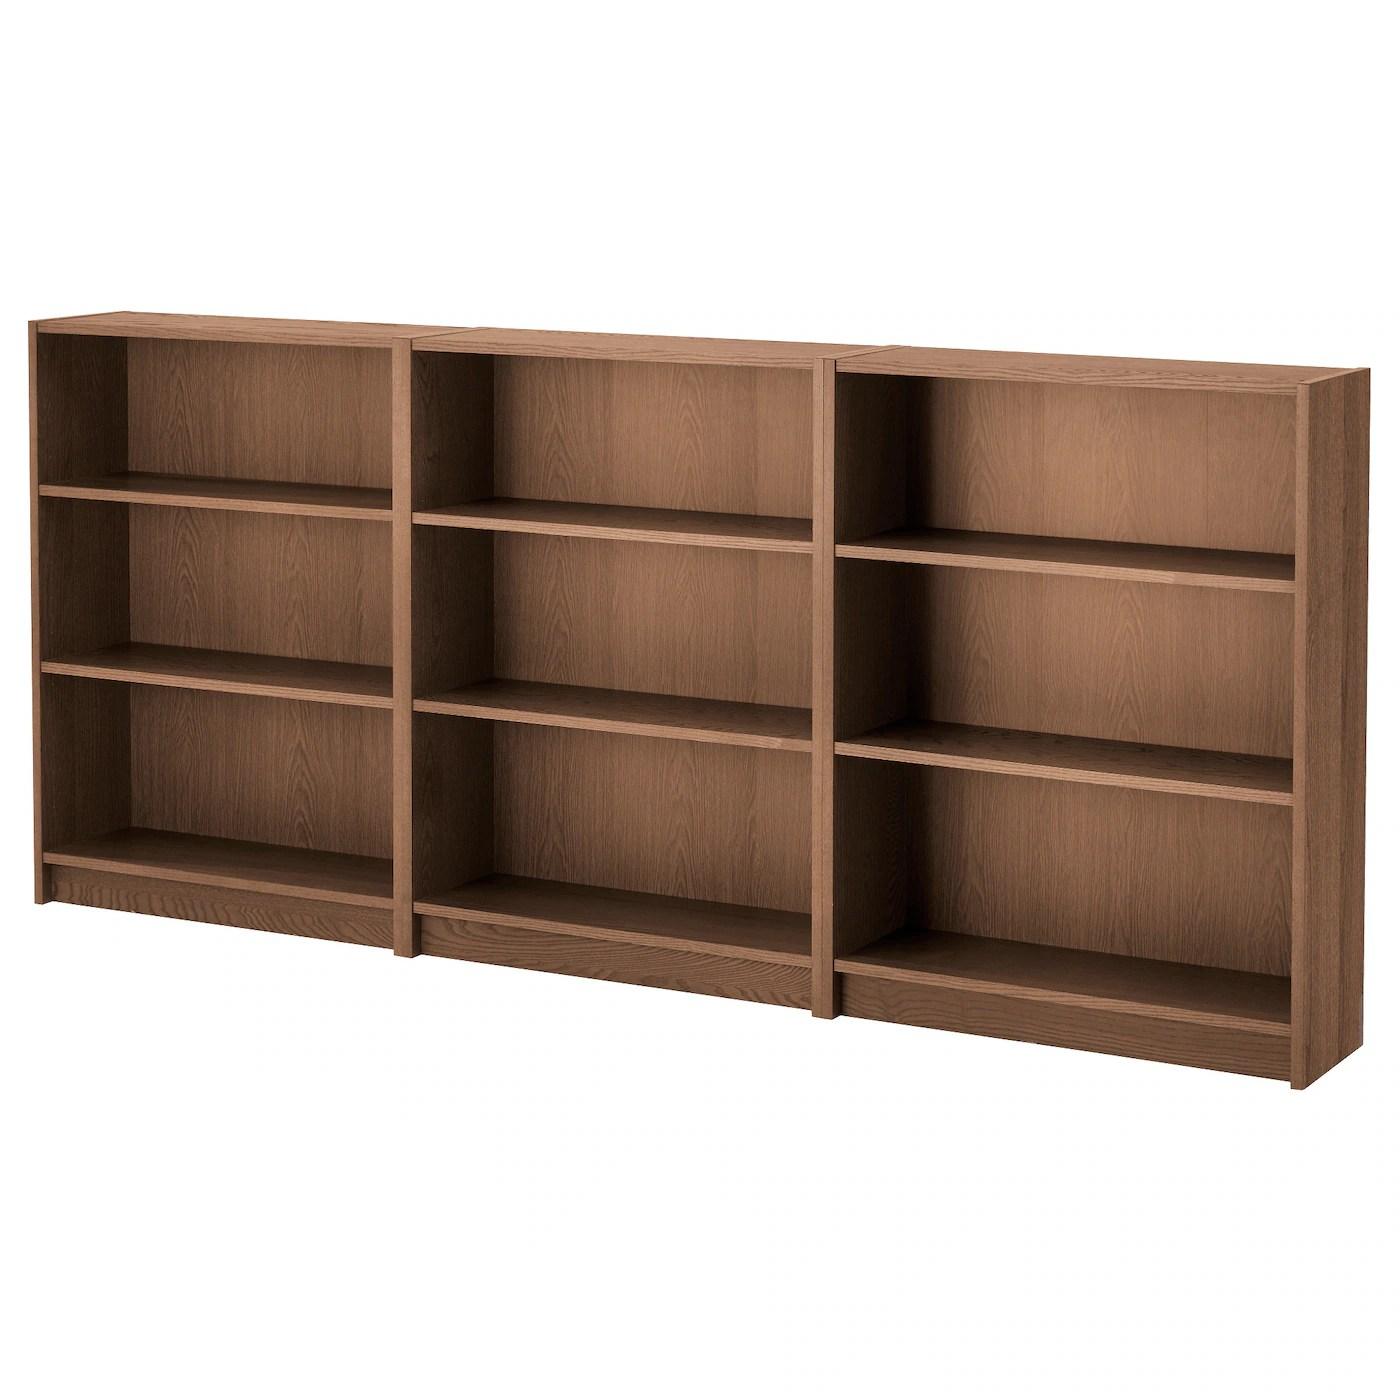 Billy Bookcase Brown Ash Veneer 240x106x28 Cm Ikea